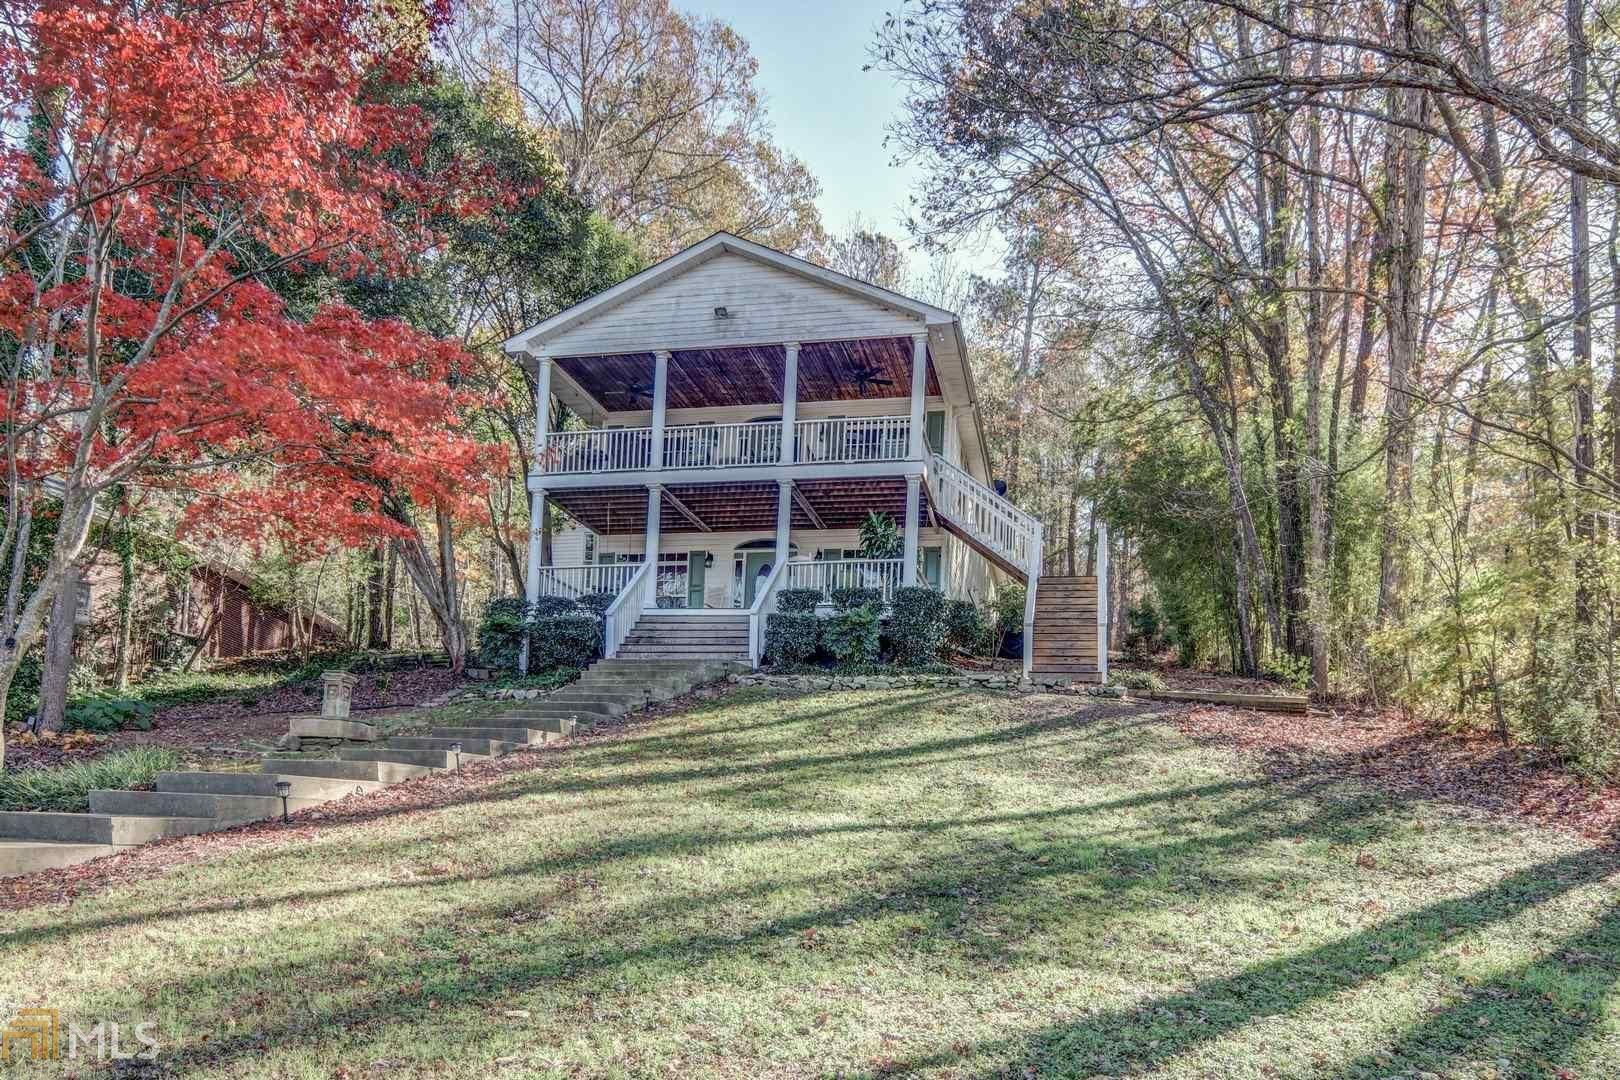 55 Swan Ct, Monticello, GA 31064 - MLS#: 8907448